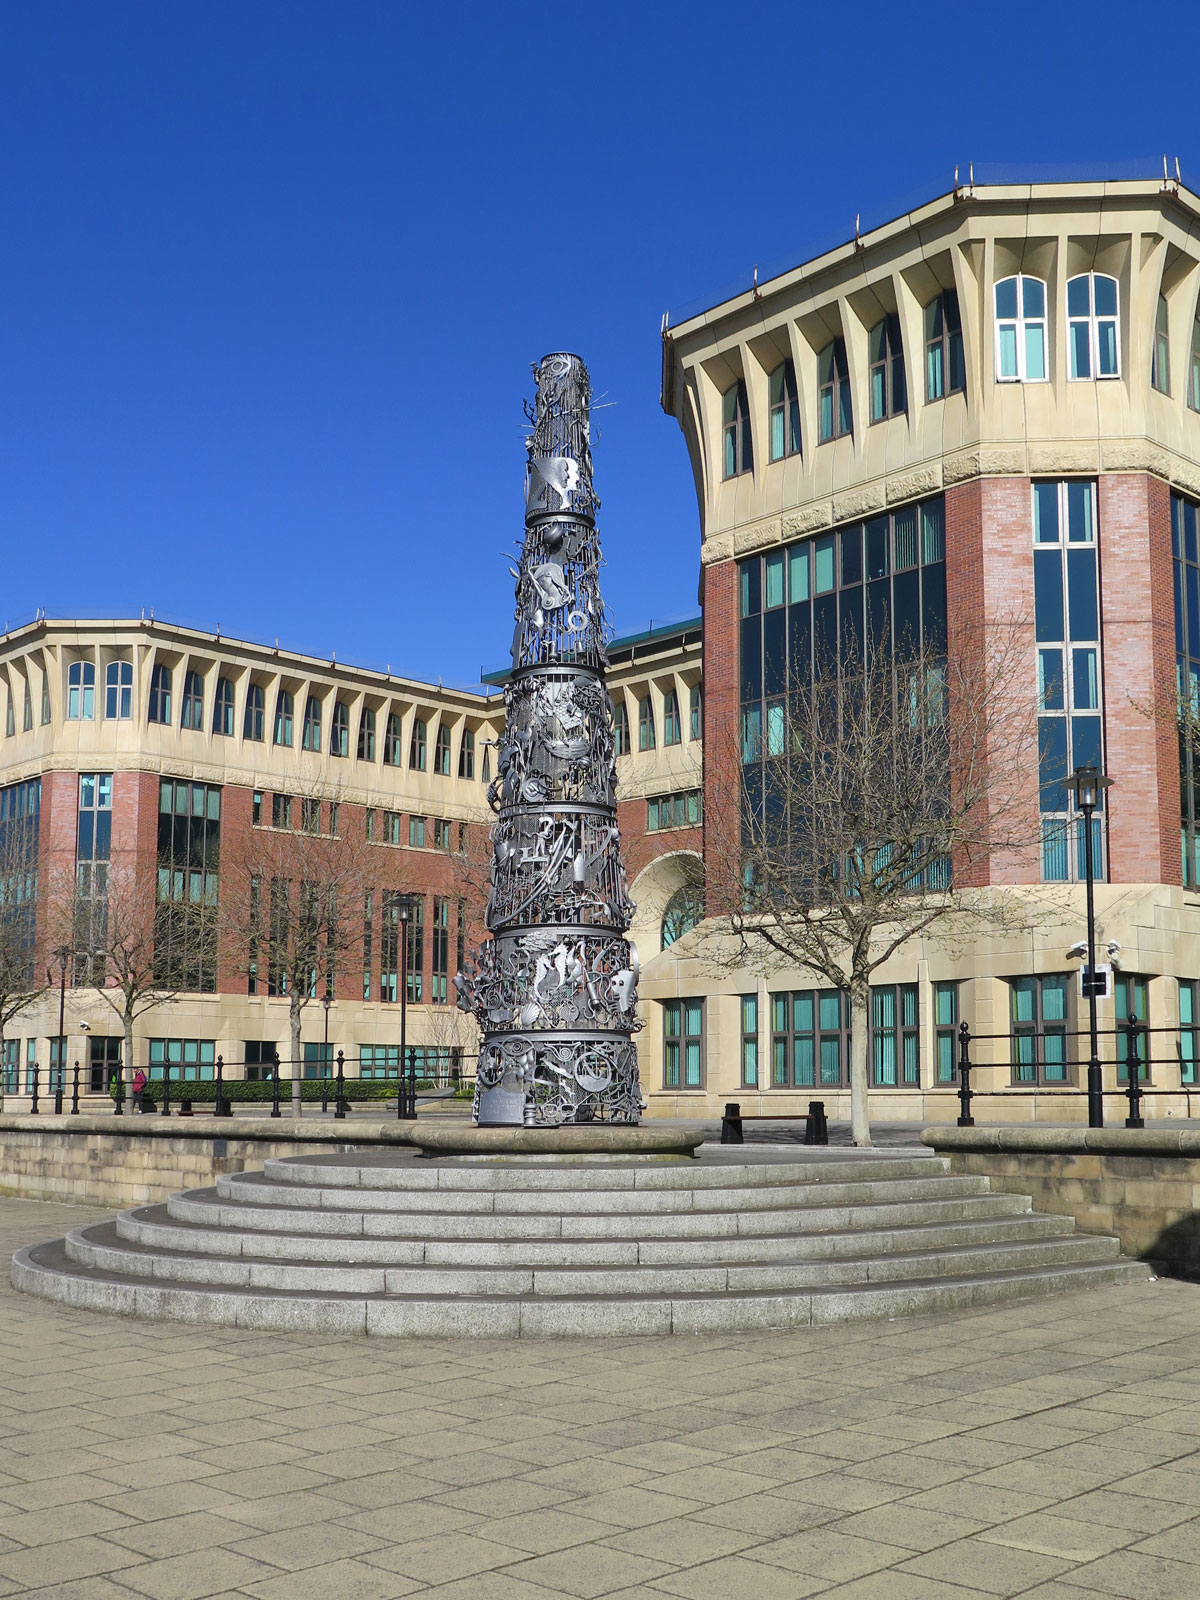 The Blacksmith's Needle Sculpture